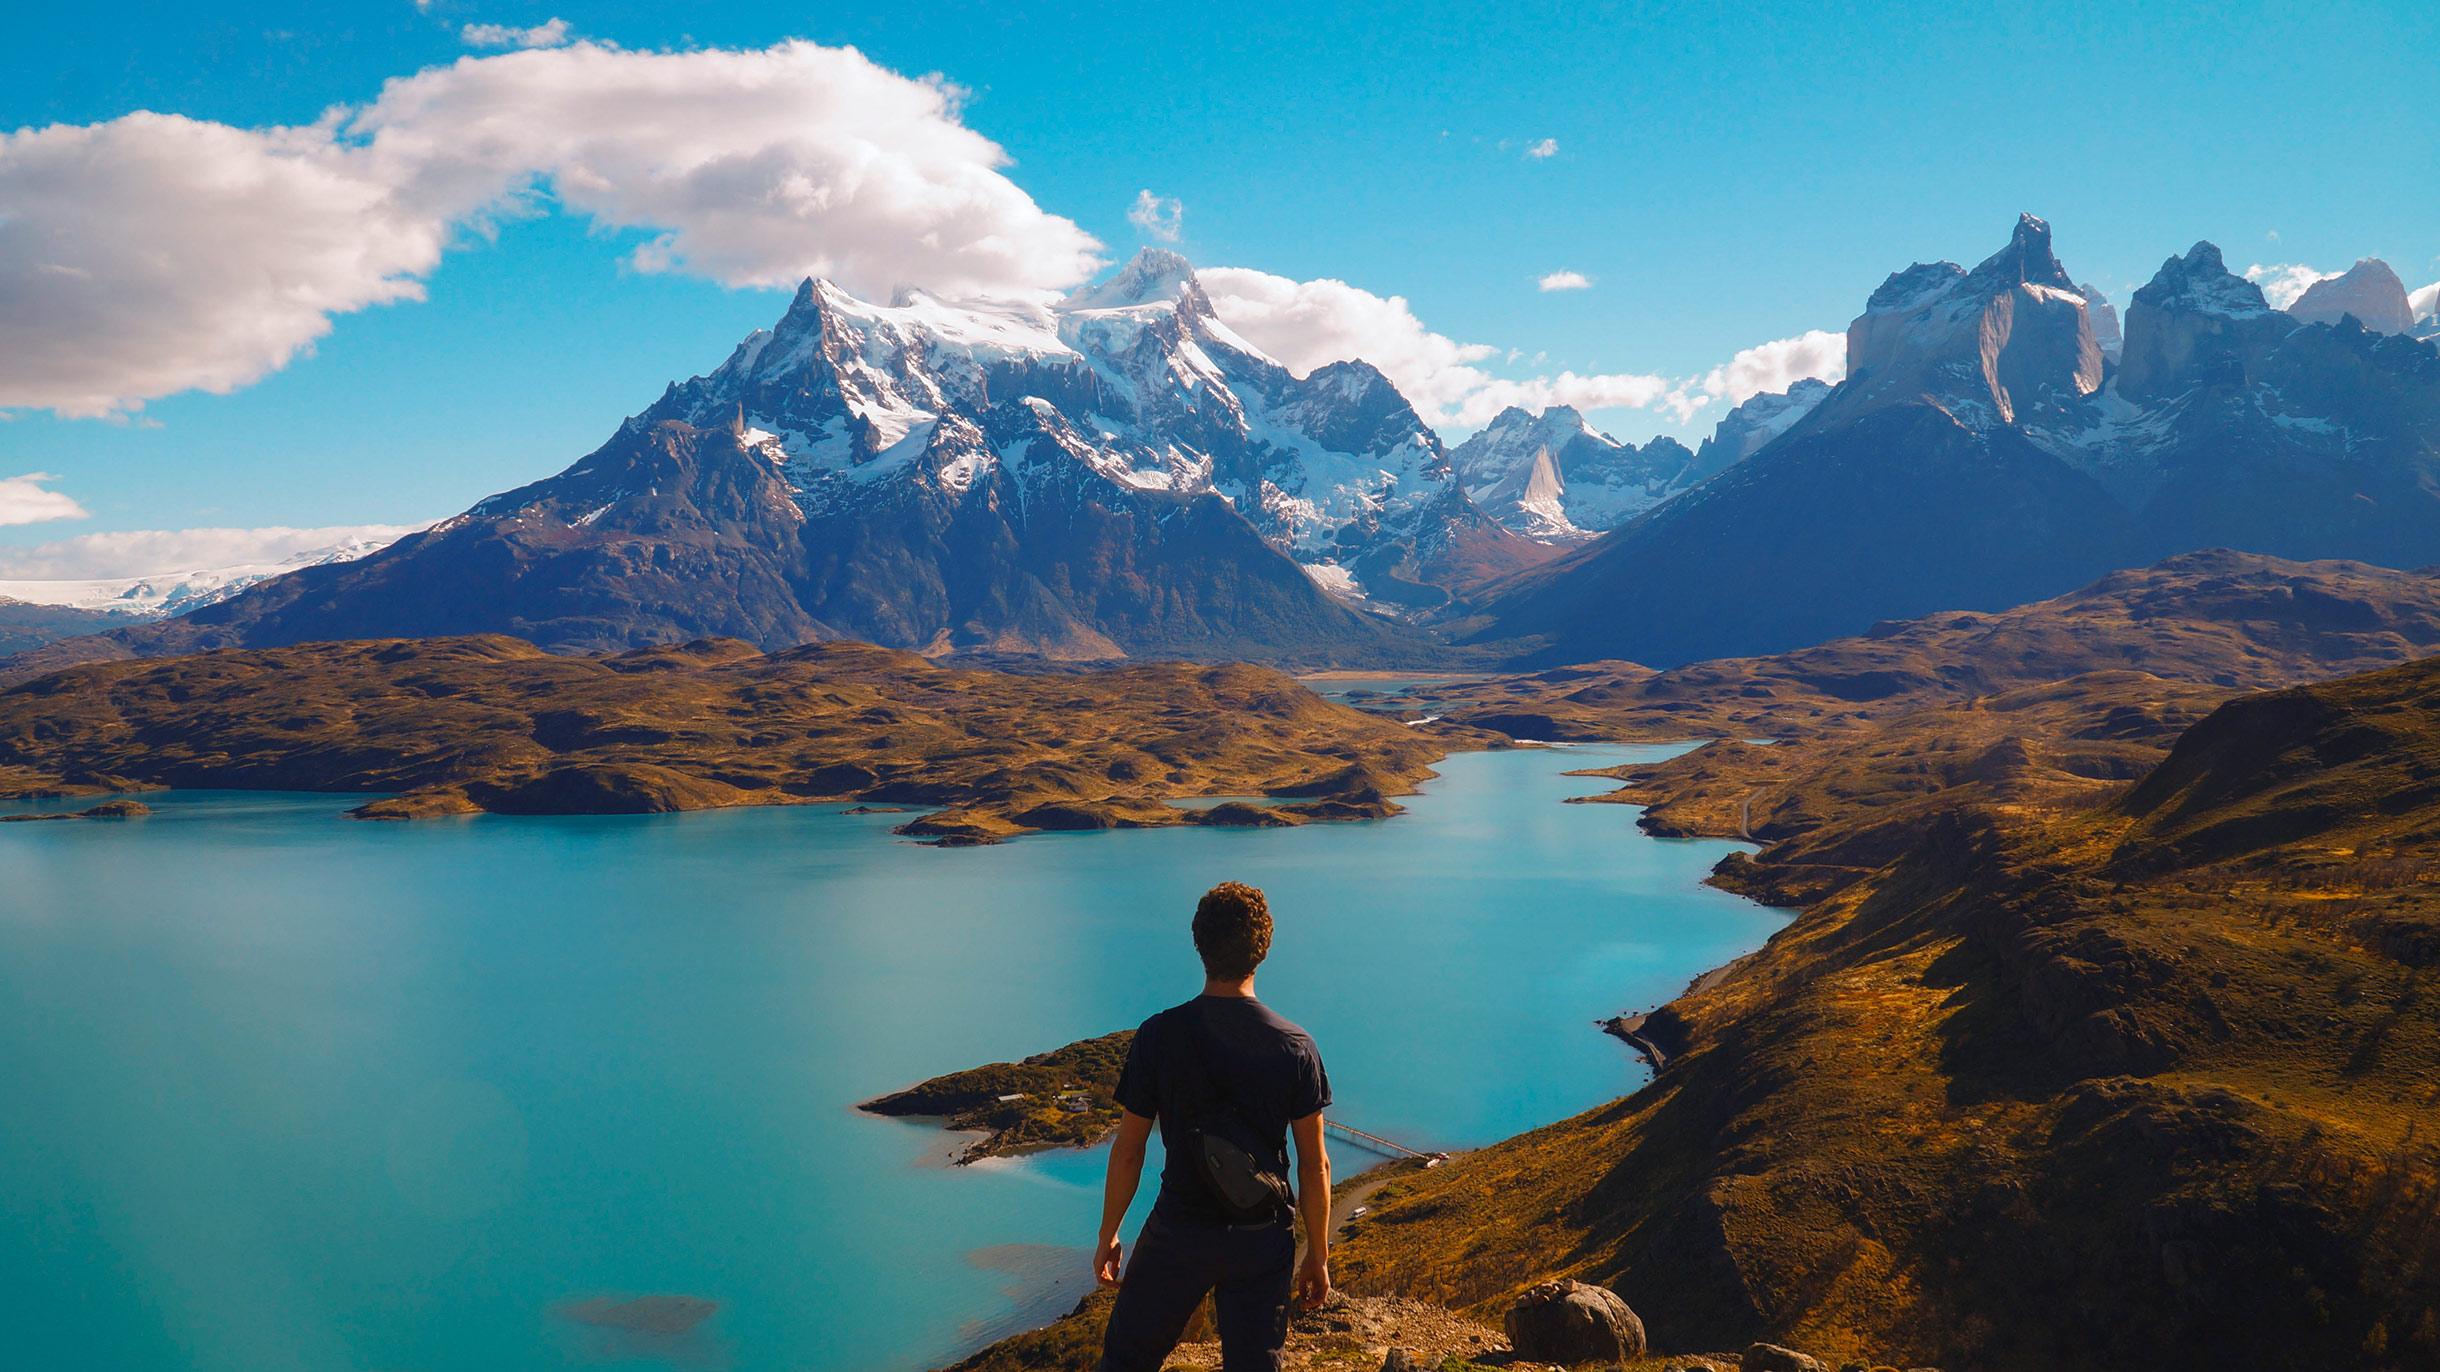 Я объехал аргентинскую Патагонию автостопом